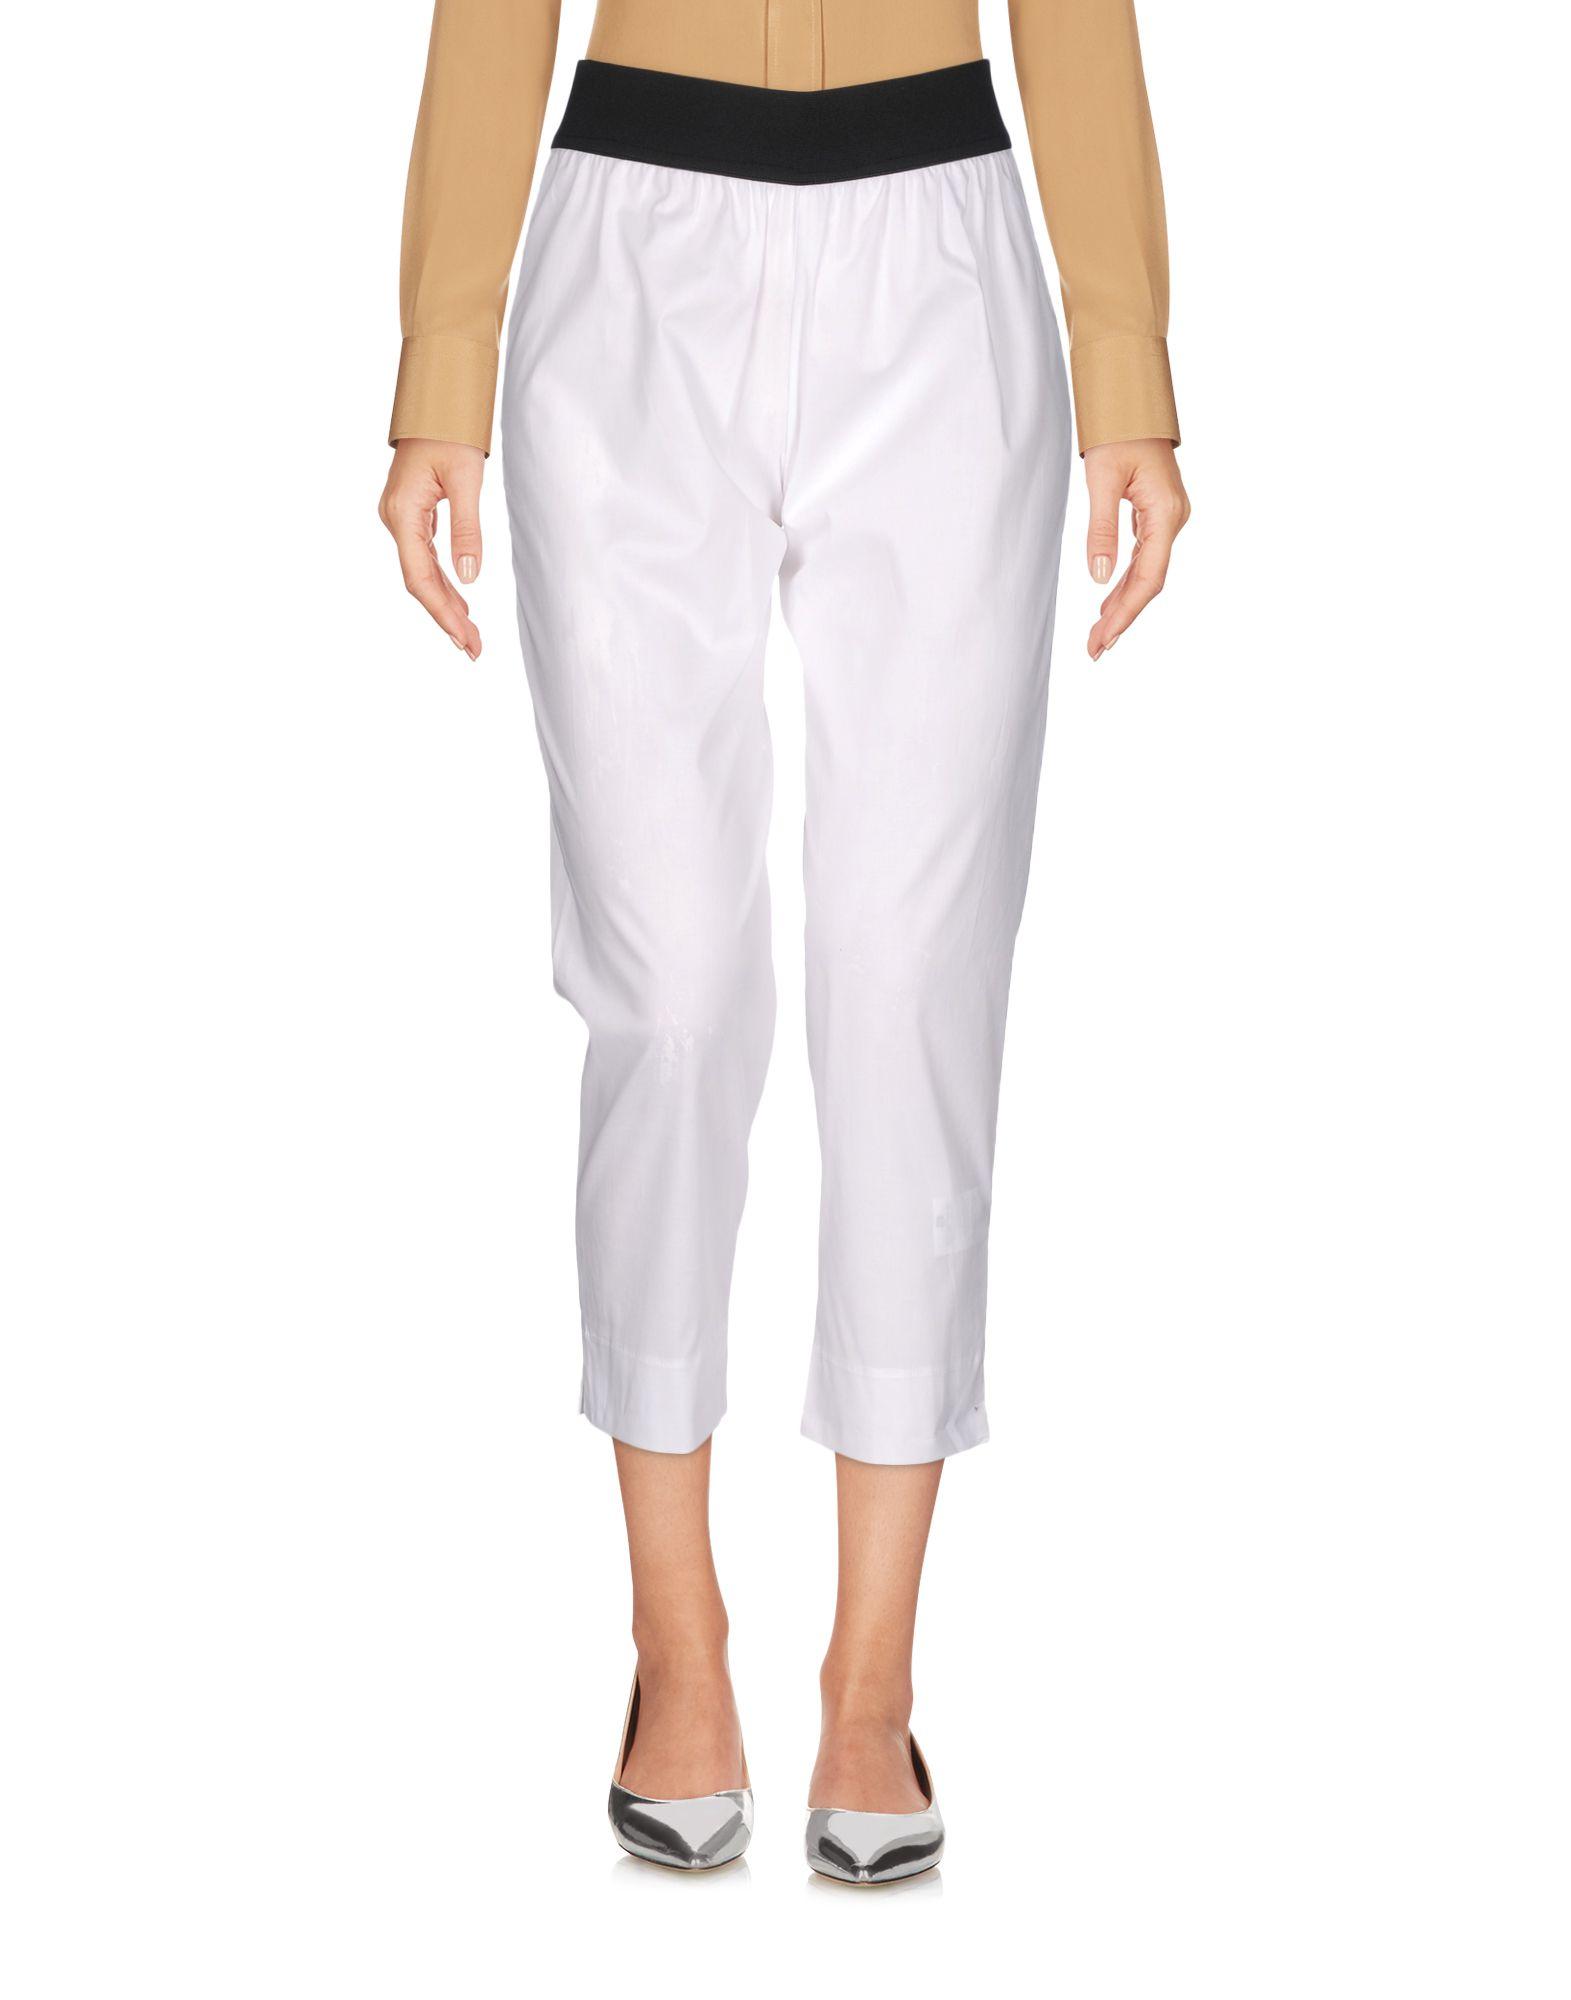 MARIA CALDERARA Cropped Pants & Culottes in White